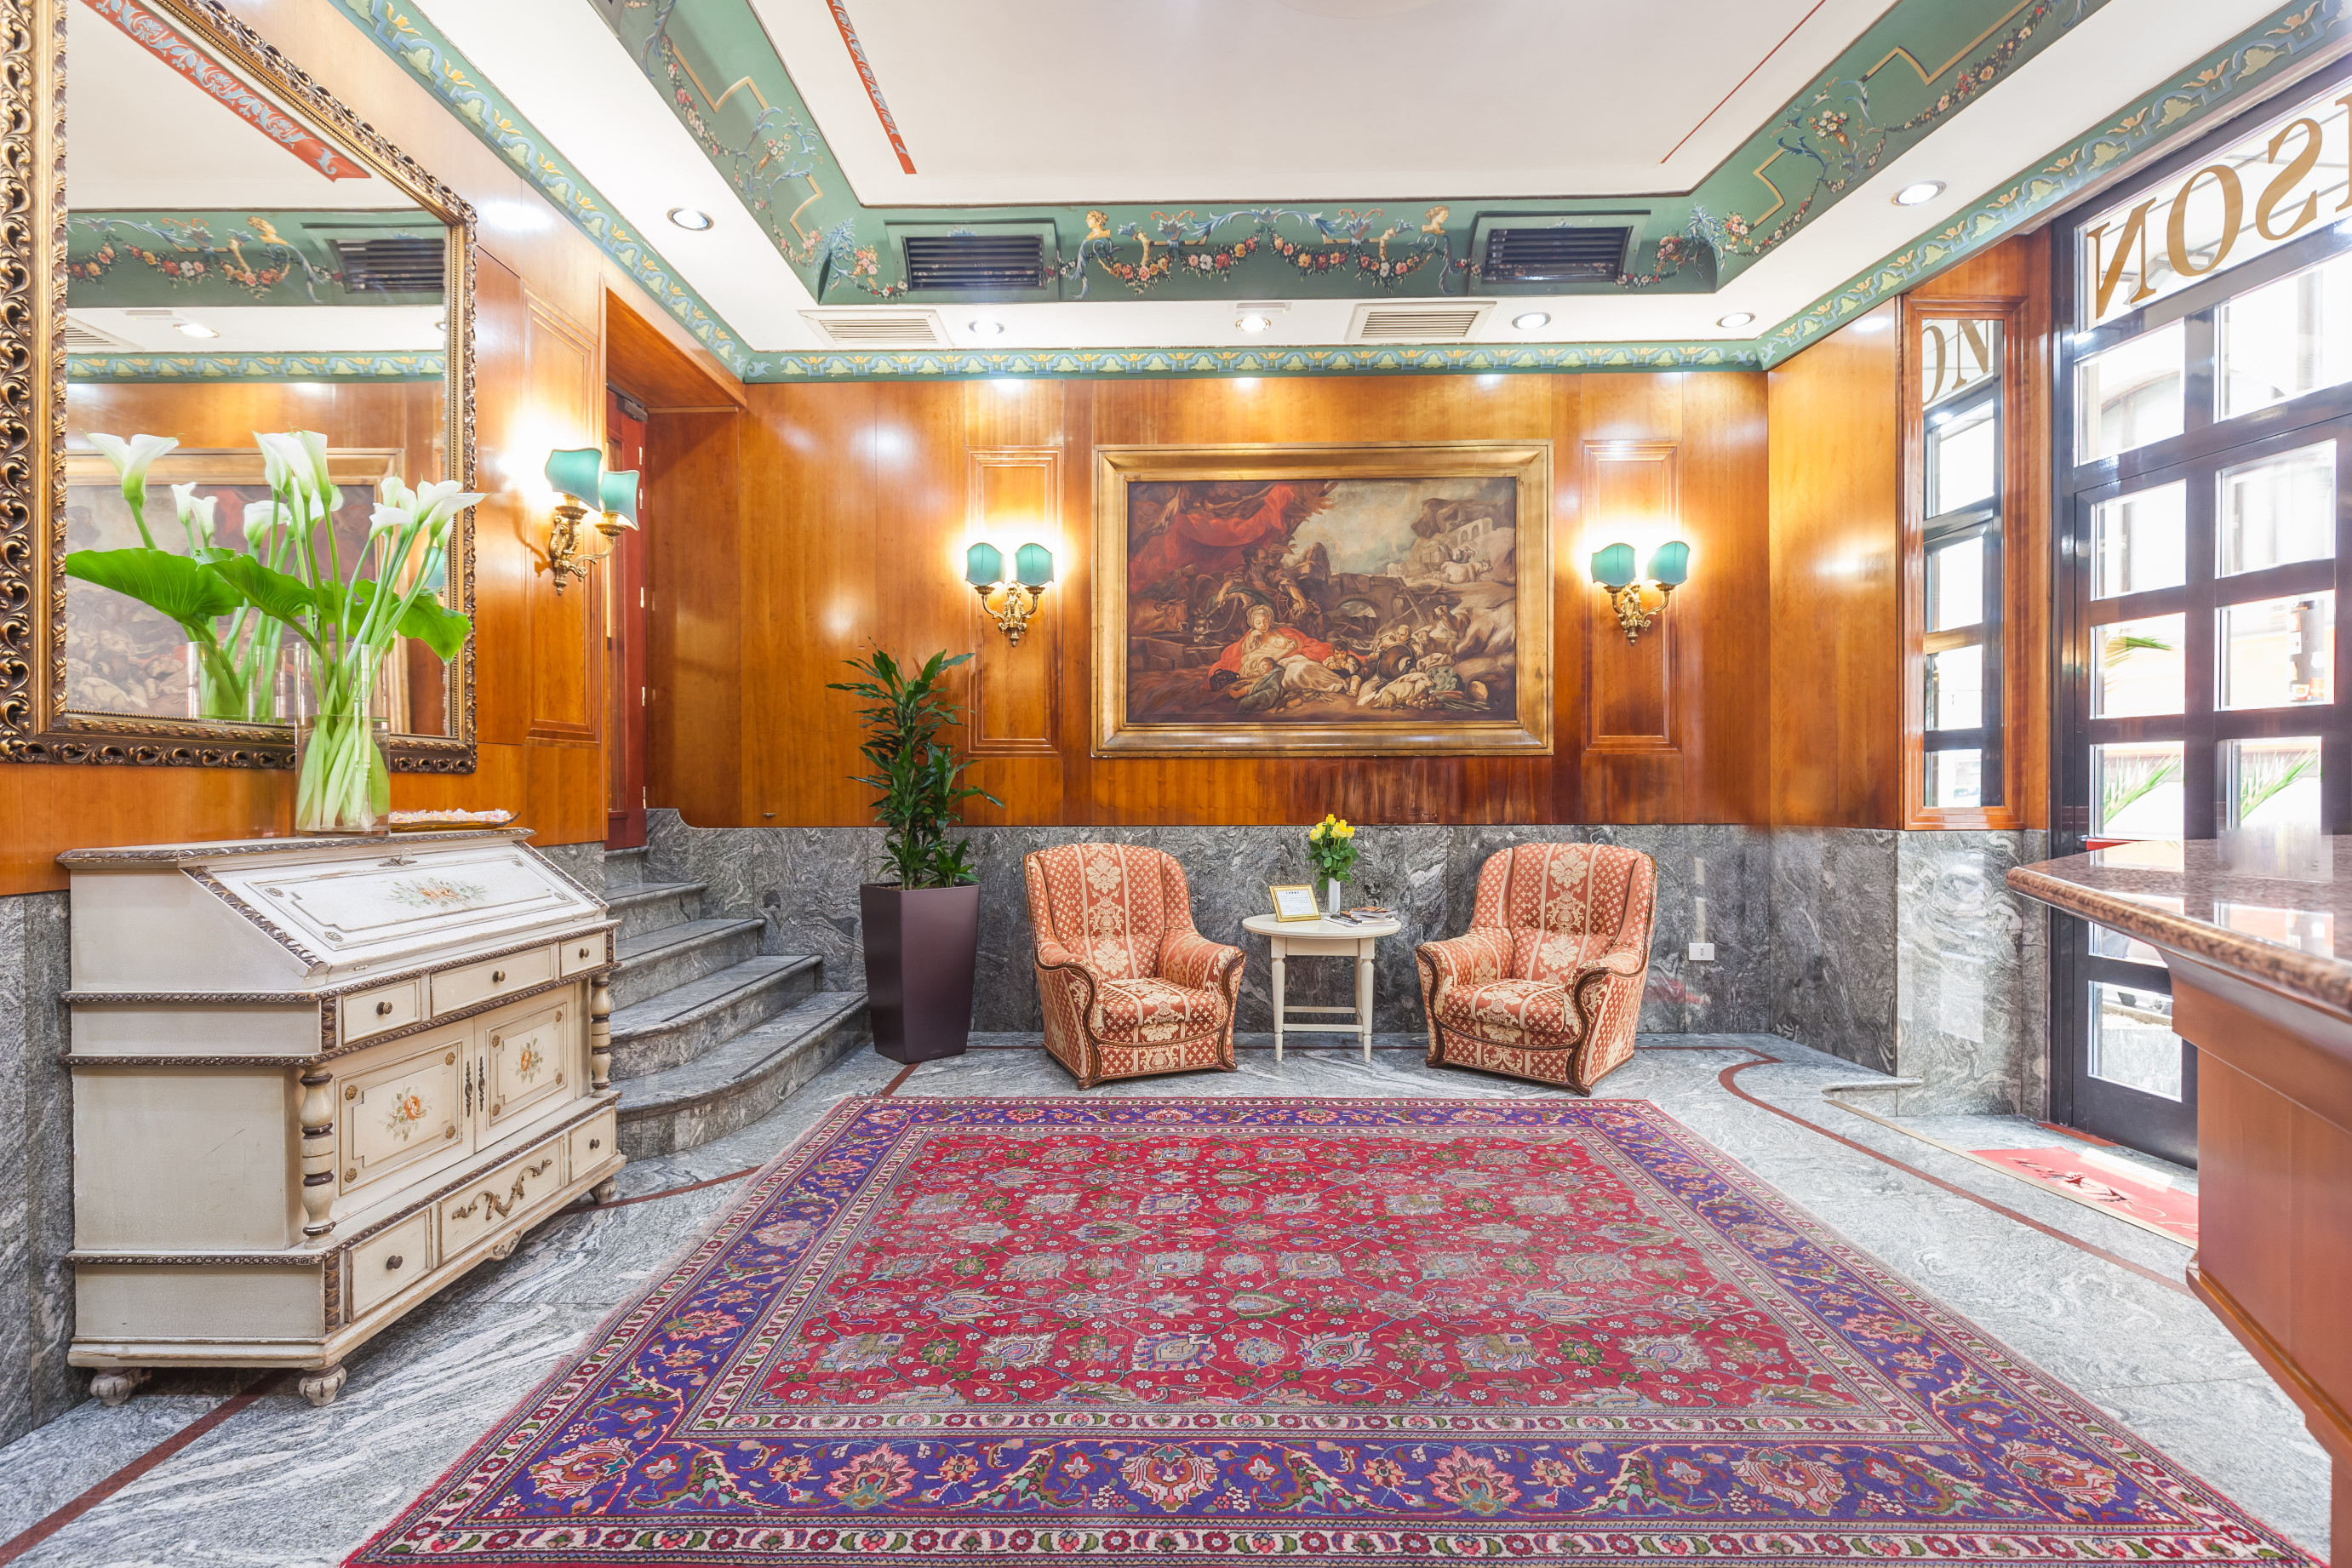 Hotel madison roma desde 112 rumbo for Hotel madison milano